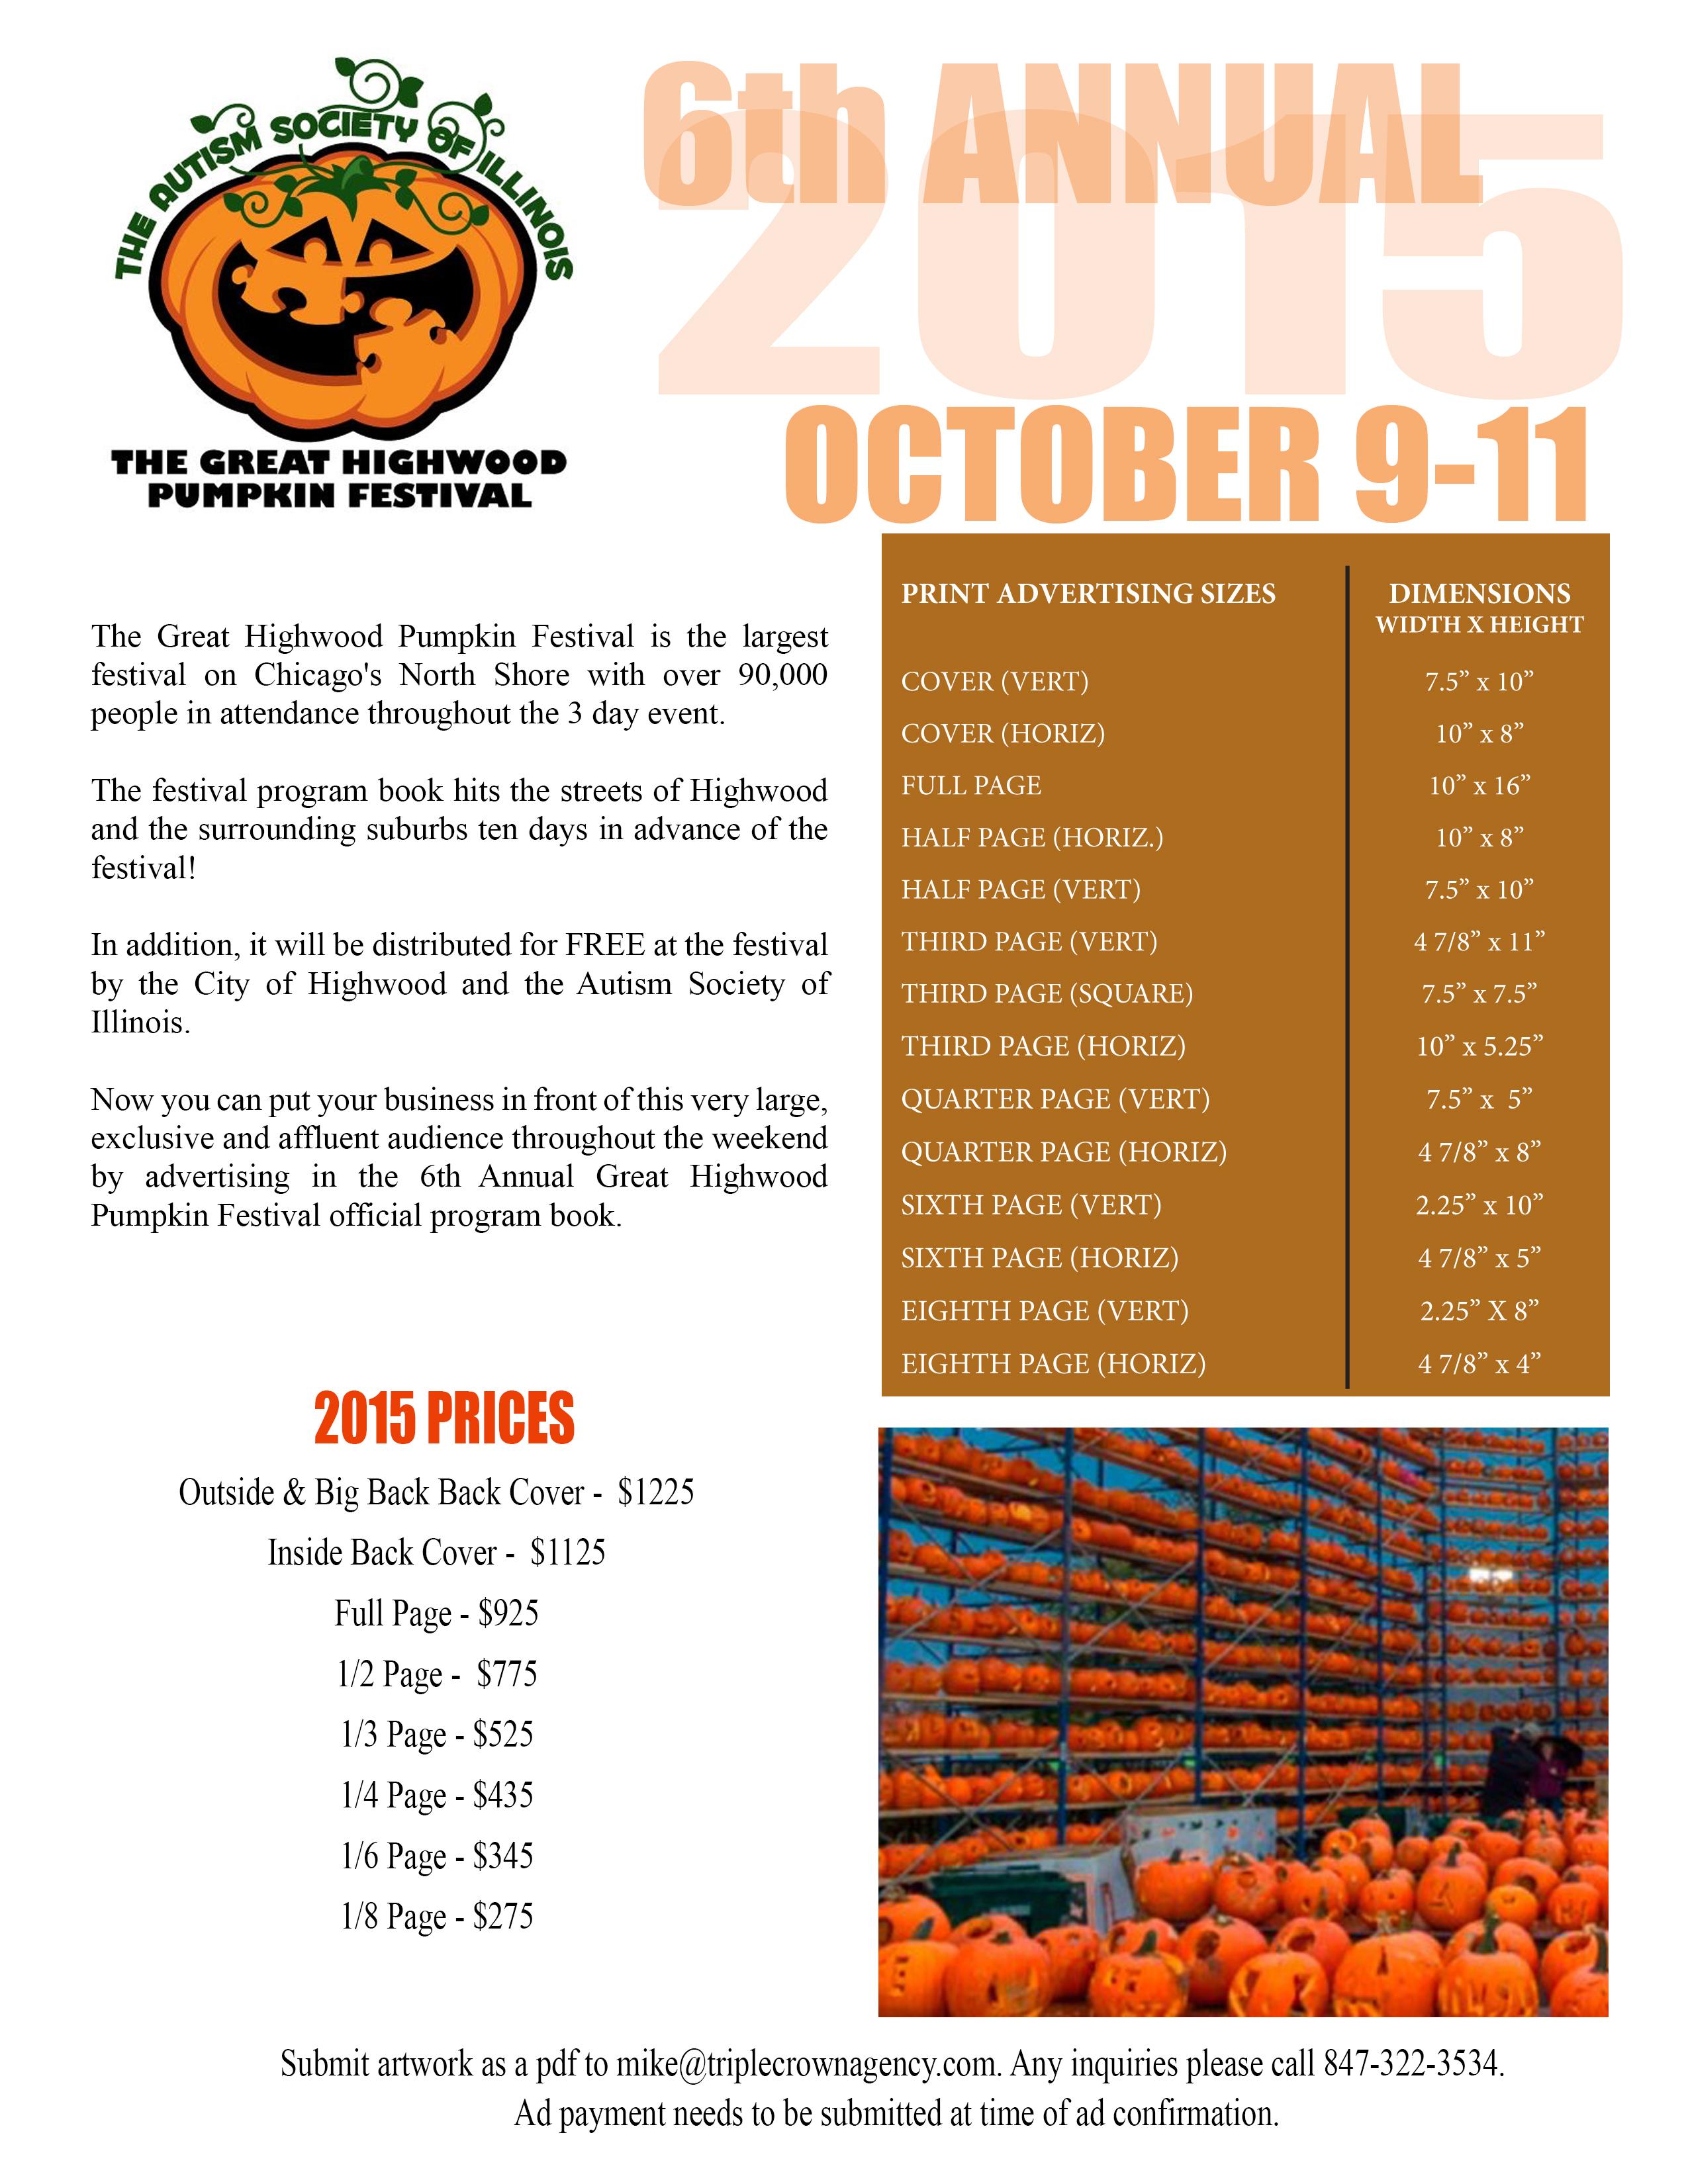 Highwood Pumpkin Festival Advertising Rates